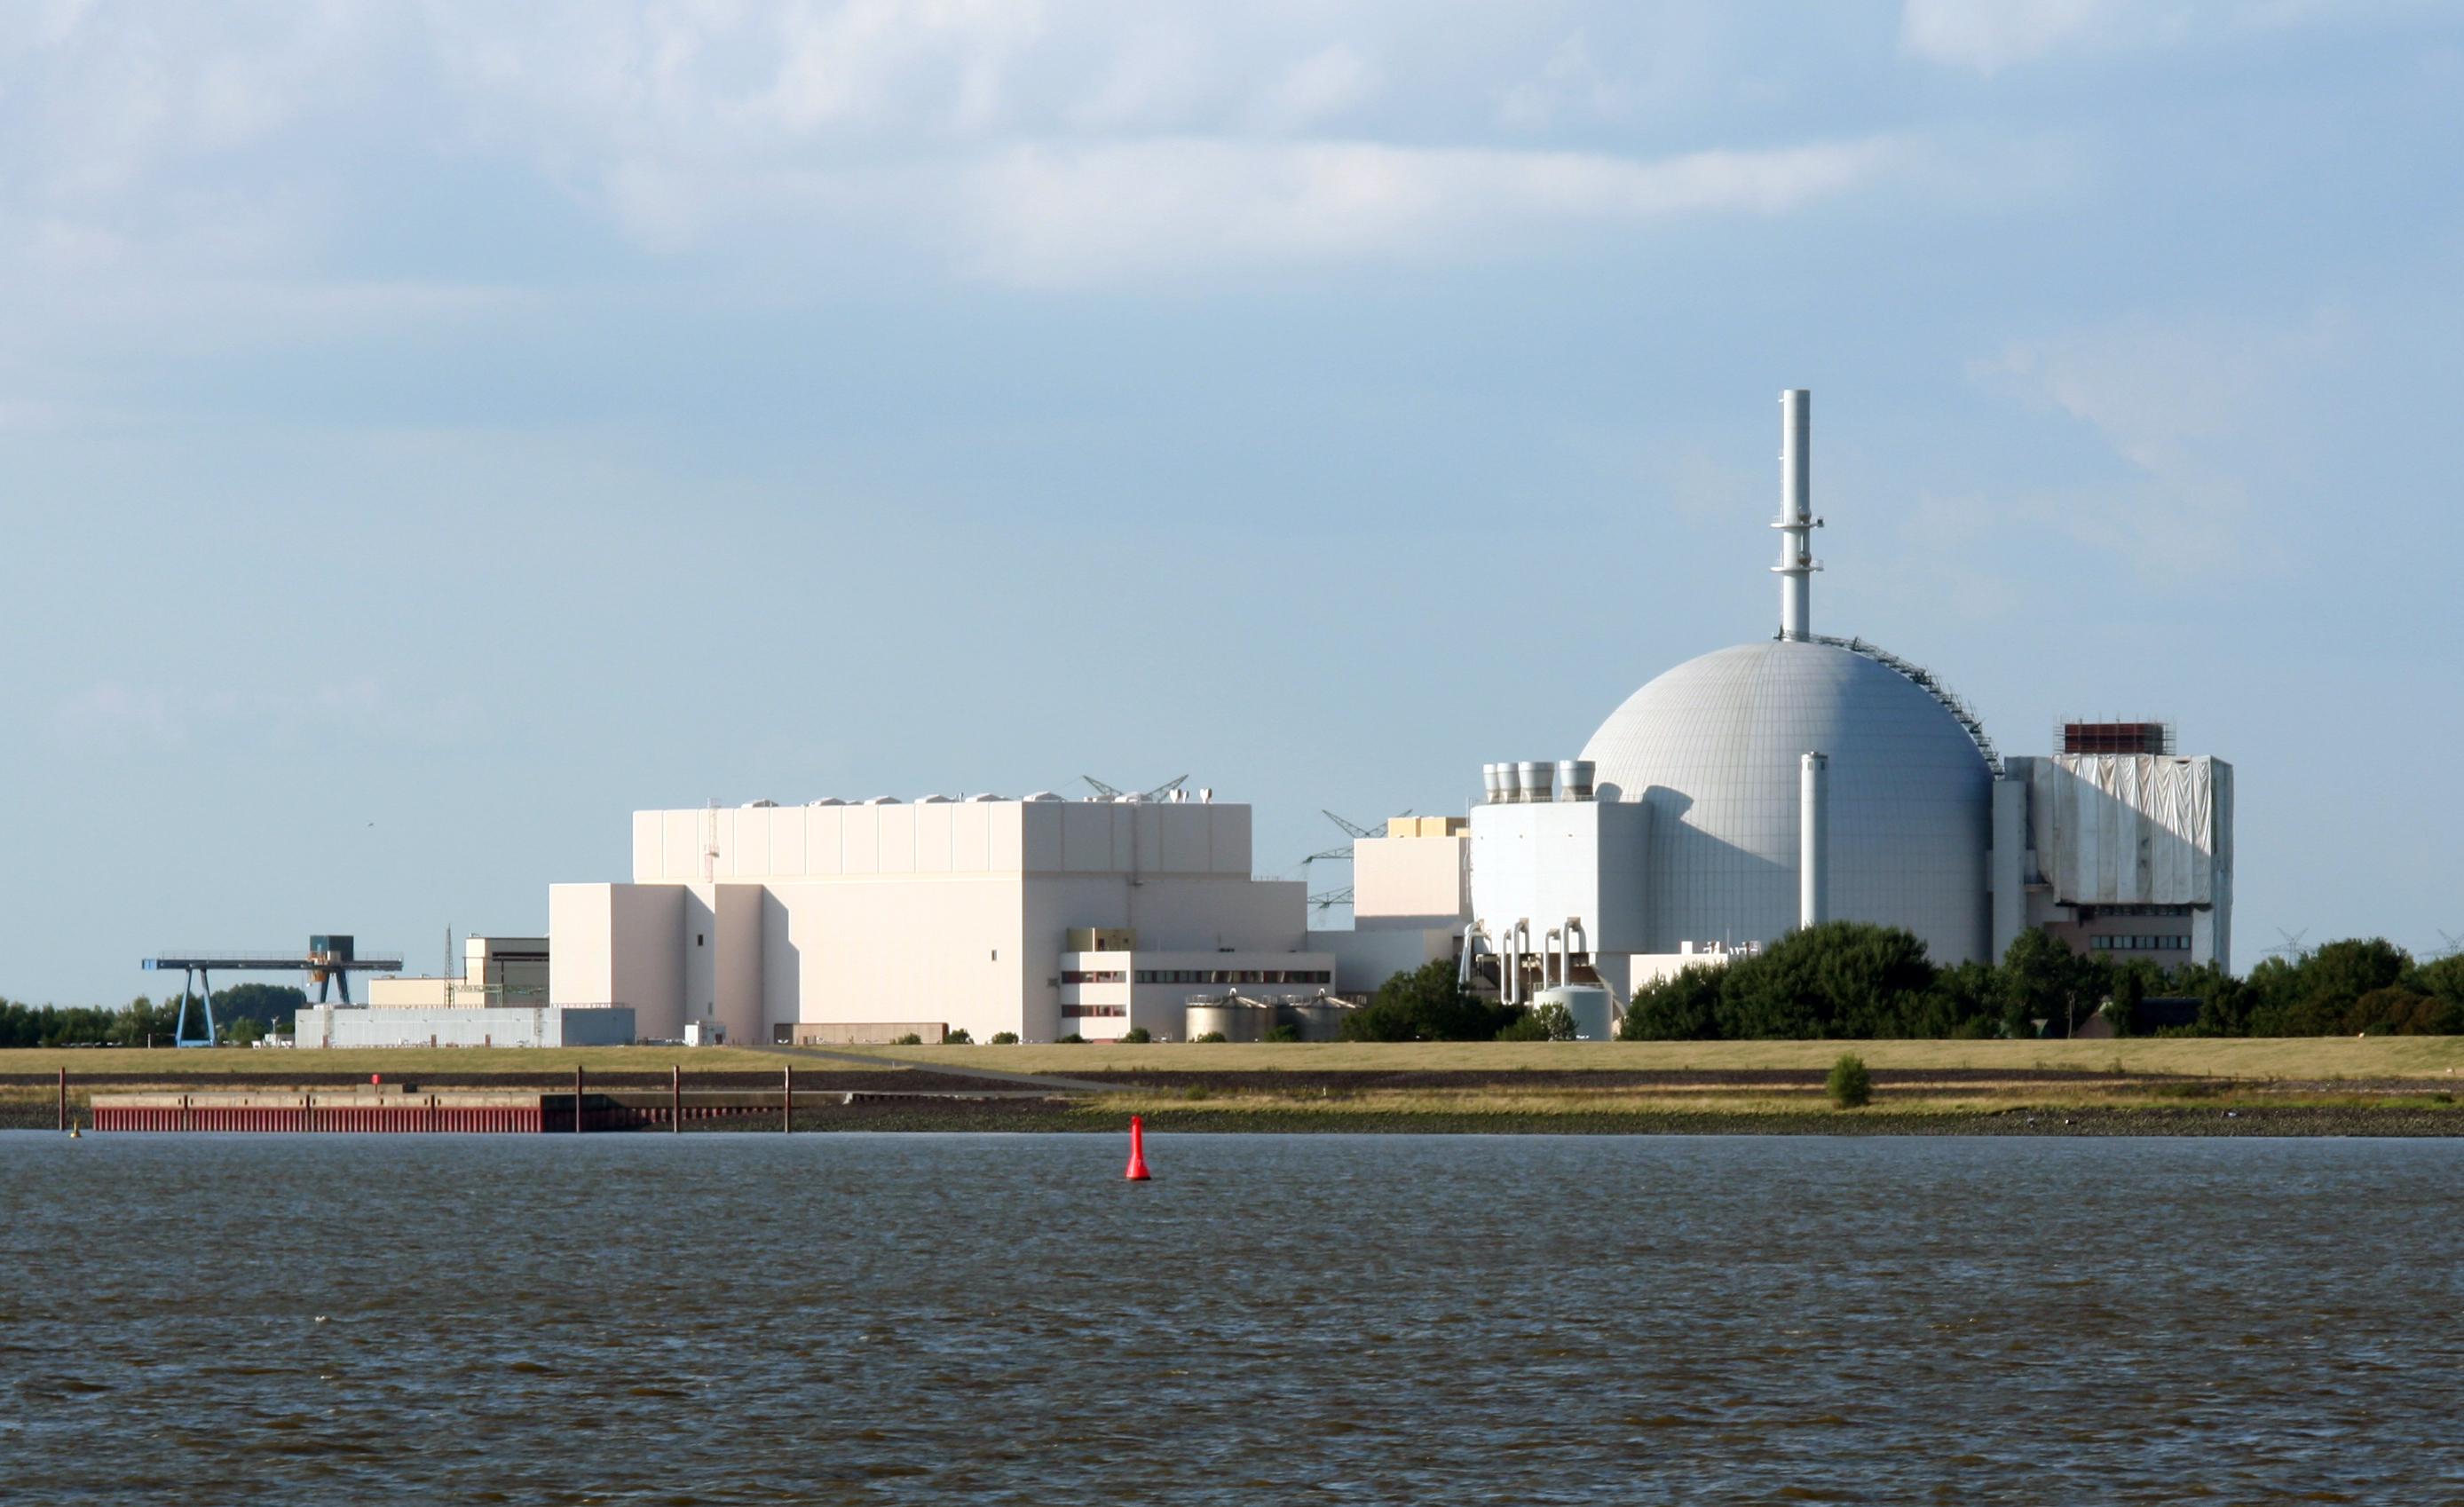 http://de.academic.ru/pictures/dewiki/75/Kernkraftwerk_Borkdorf_2.jpg